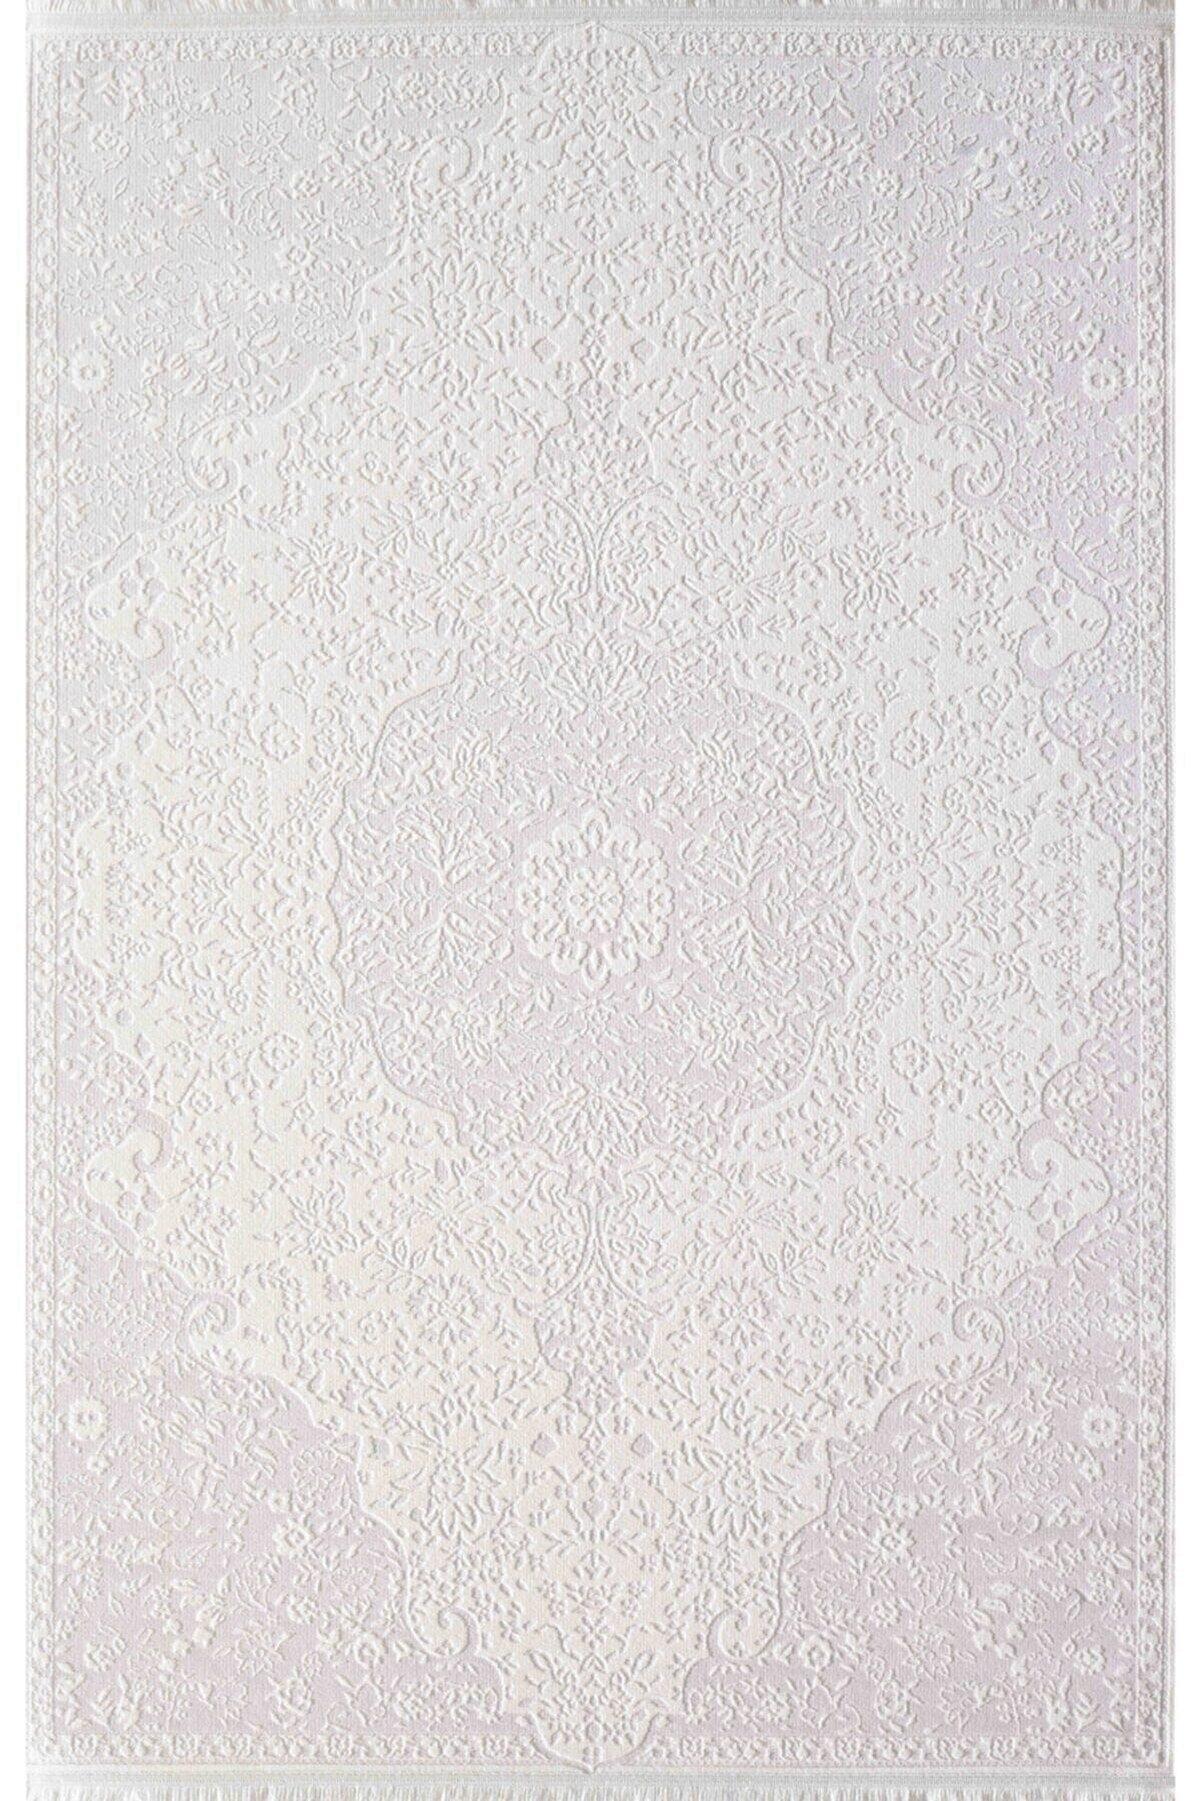 Royal Pera Koleksiyonu Pp05c 100x300s Sigortalı Halı